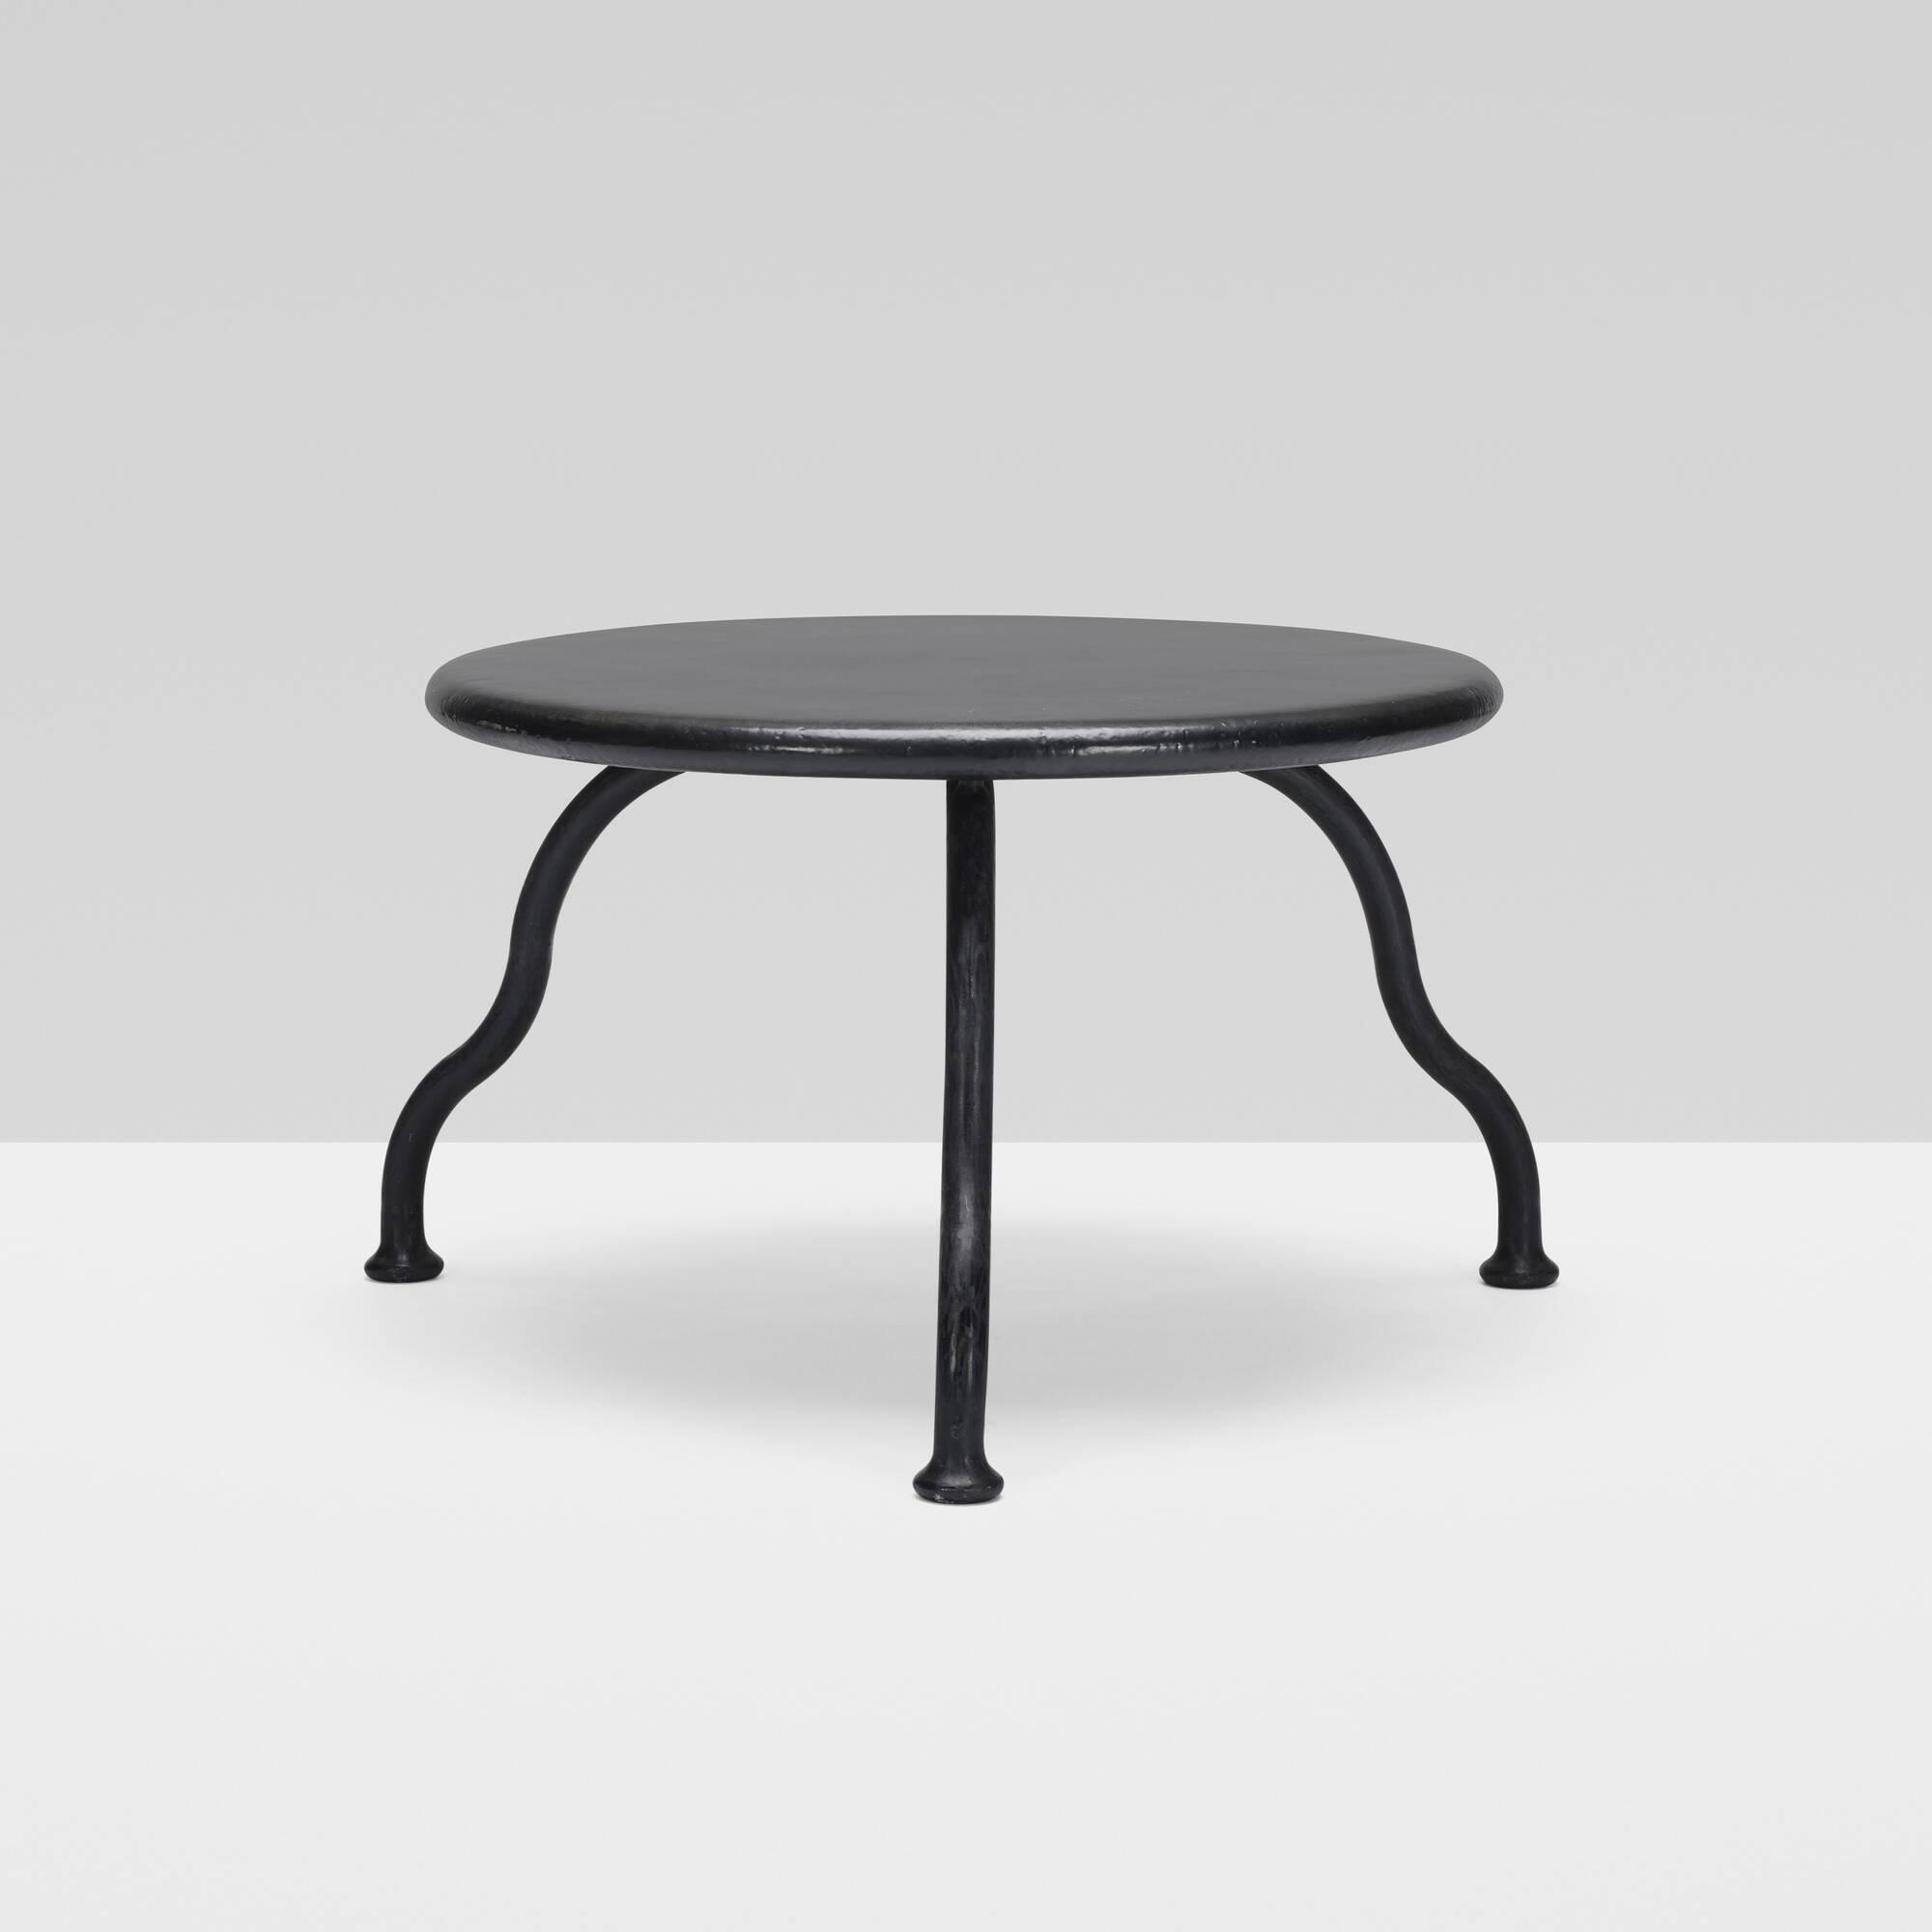 262: Atelier Van Lieshout / Bad Little Table (1 of 3)